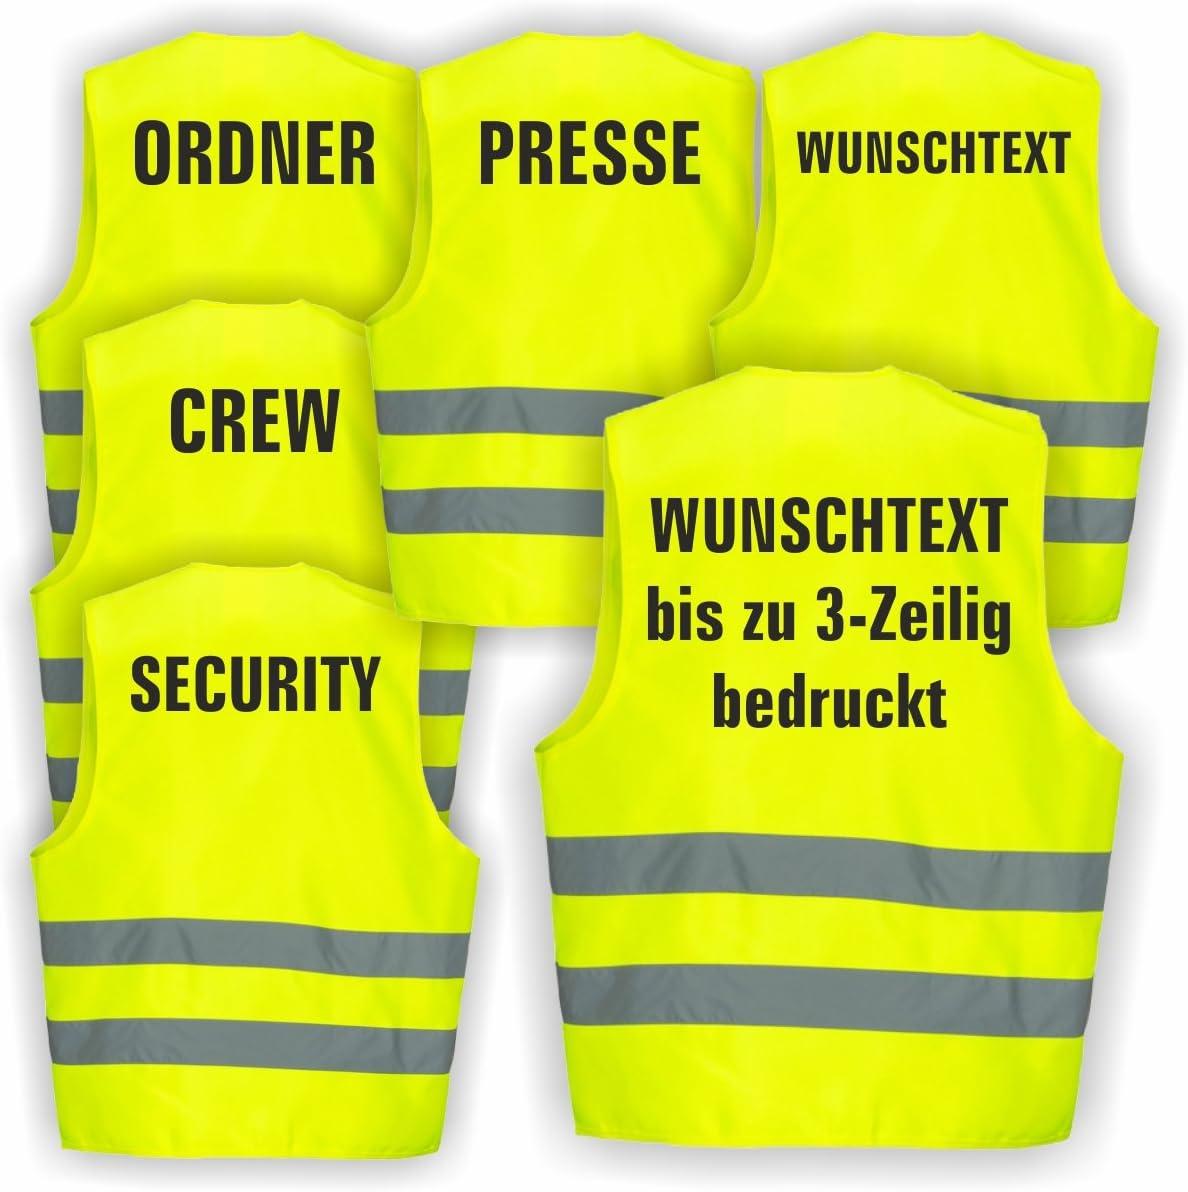 Ordner 1 Weste Warnweste GELB Sicherheitsweste Weste Ordner Security Crew